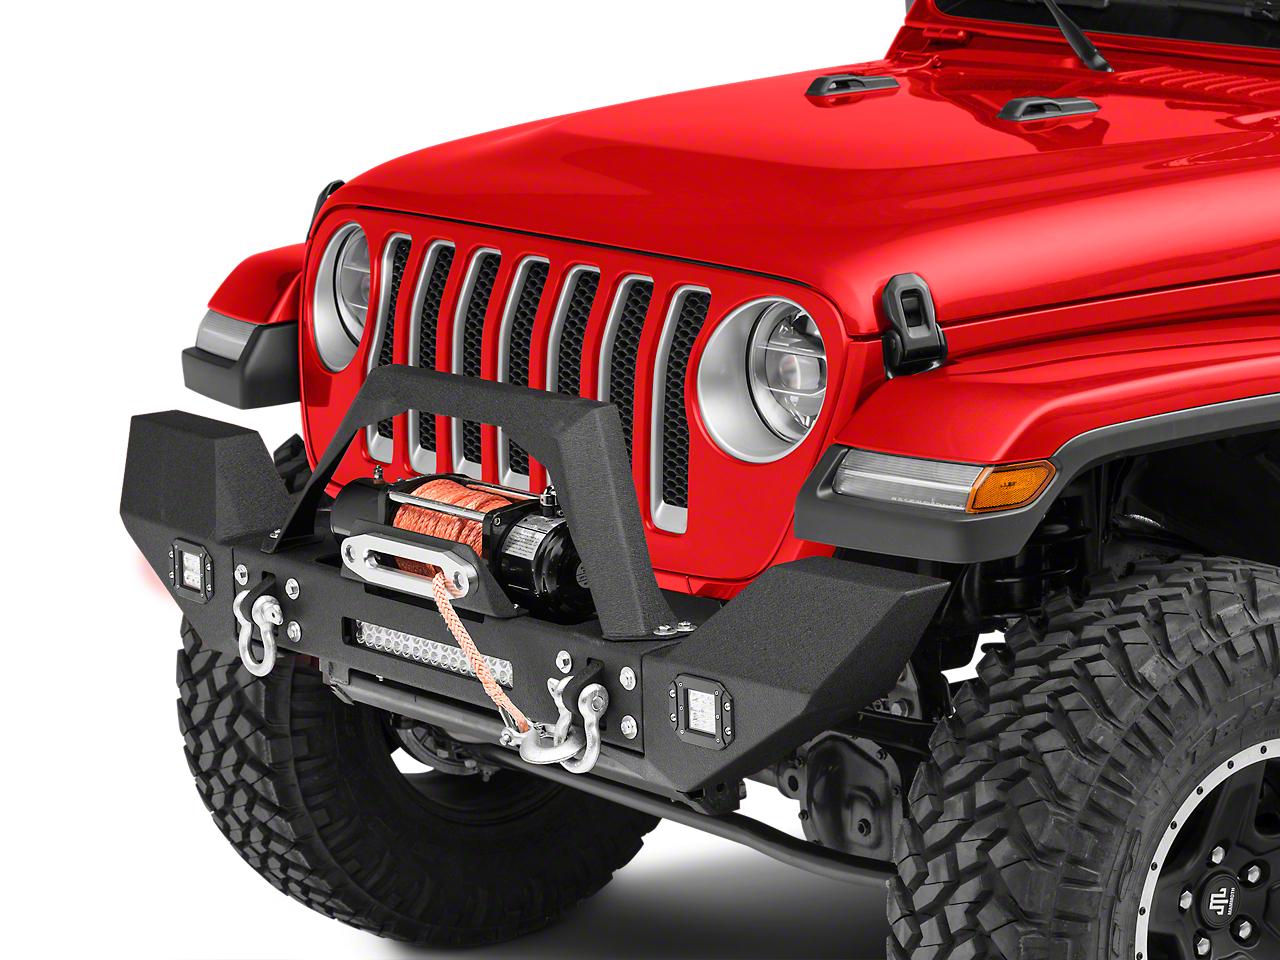 RedRock 4x4 Max-HD Full Width Front Bumper w/ LED Light Bar, Fog Lights & Winch Mount (2018 Wrangler JL)